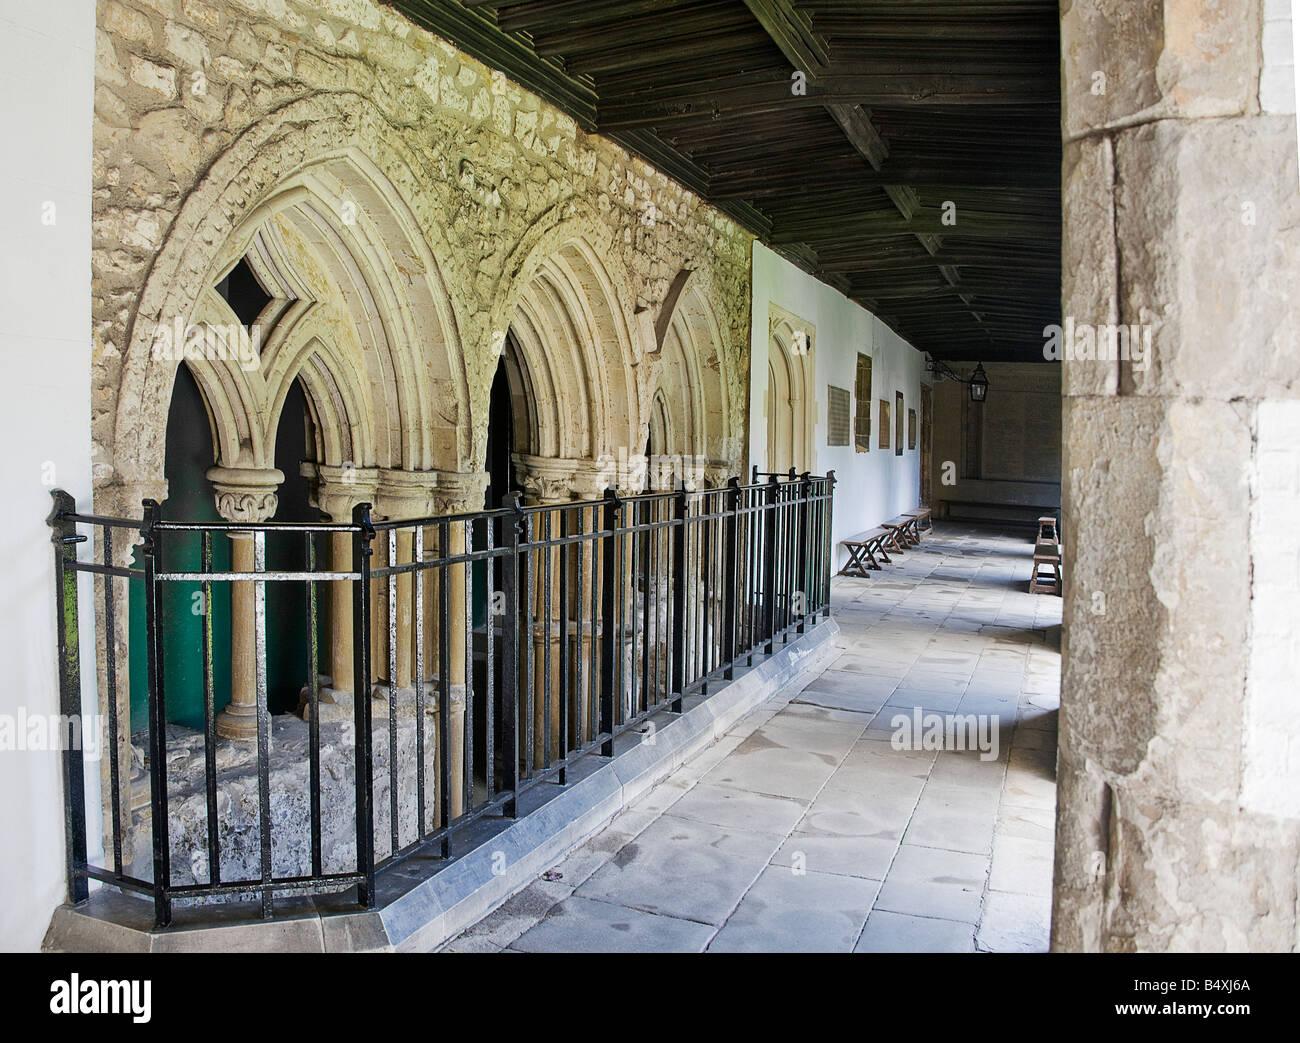 Cloister court. Jesus College Cambridge. - Stock Image